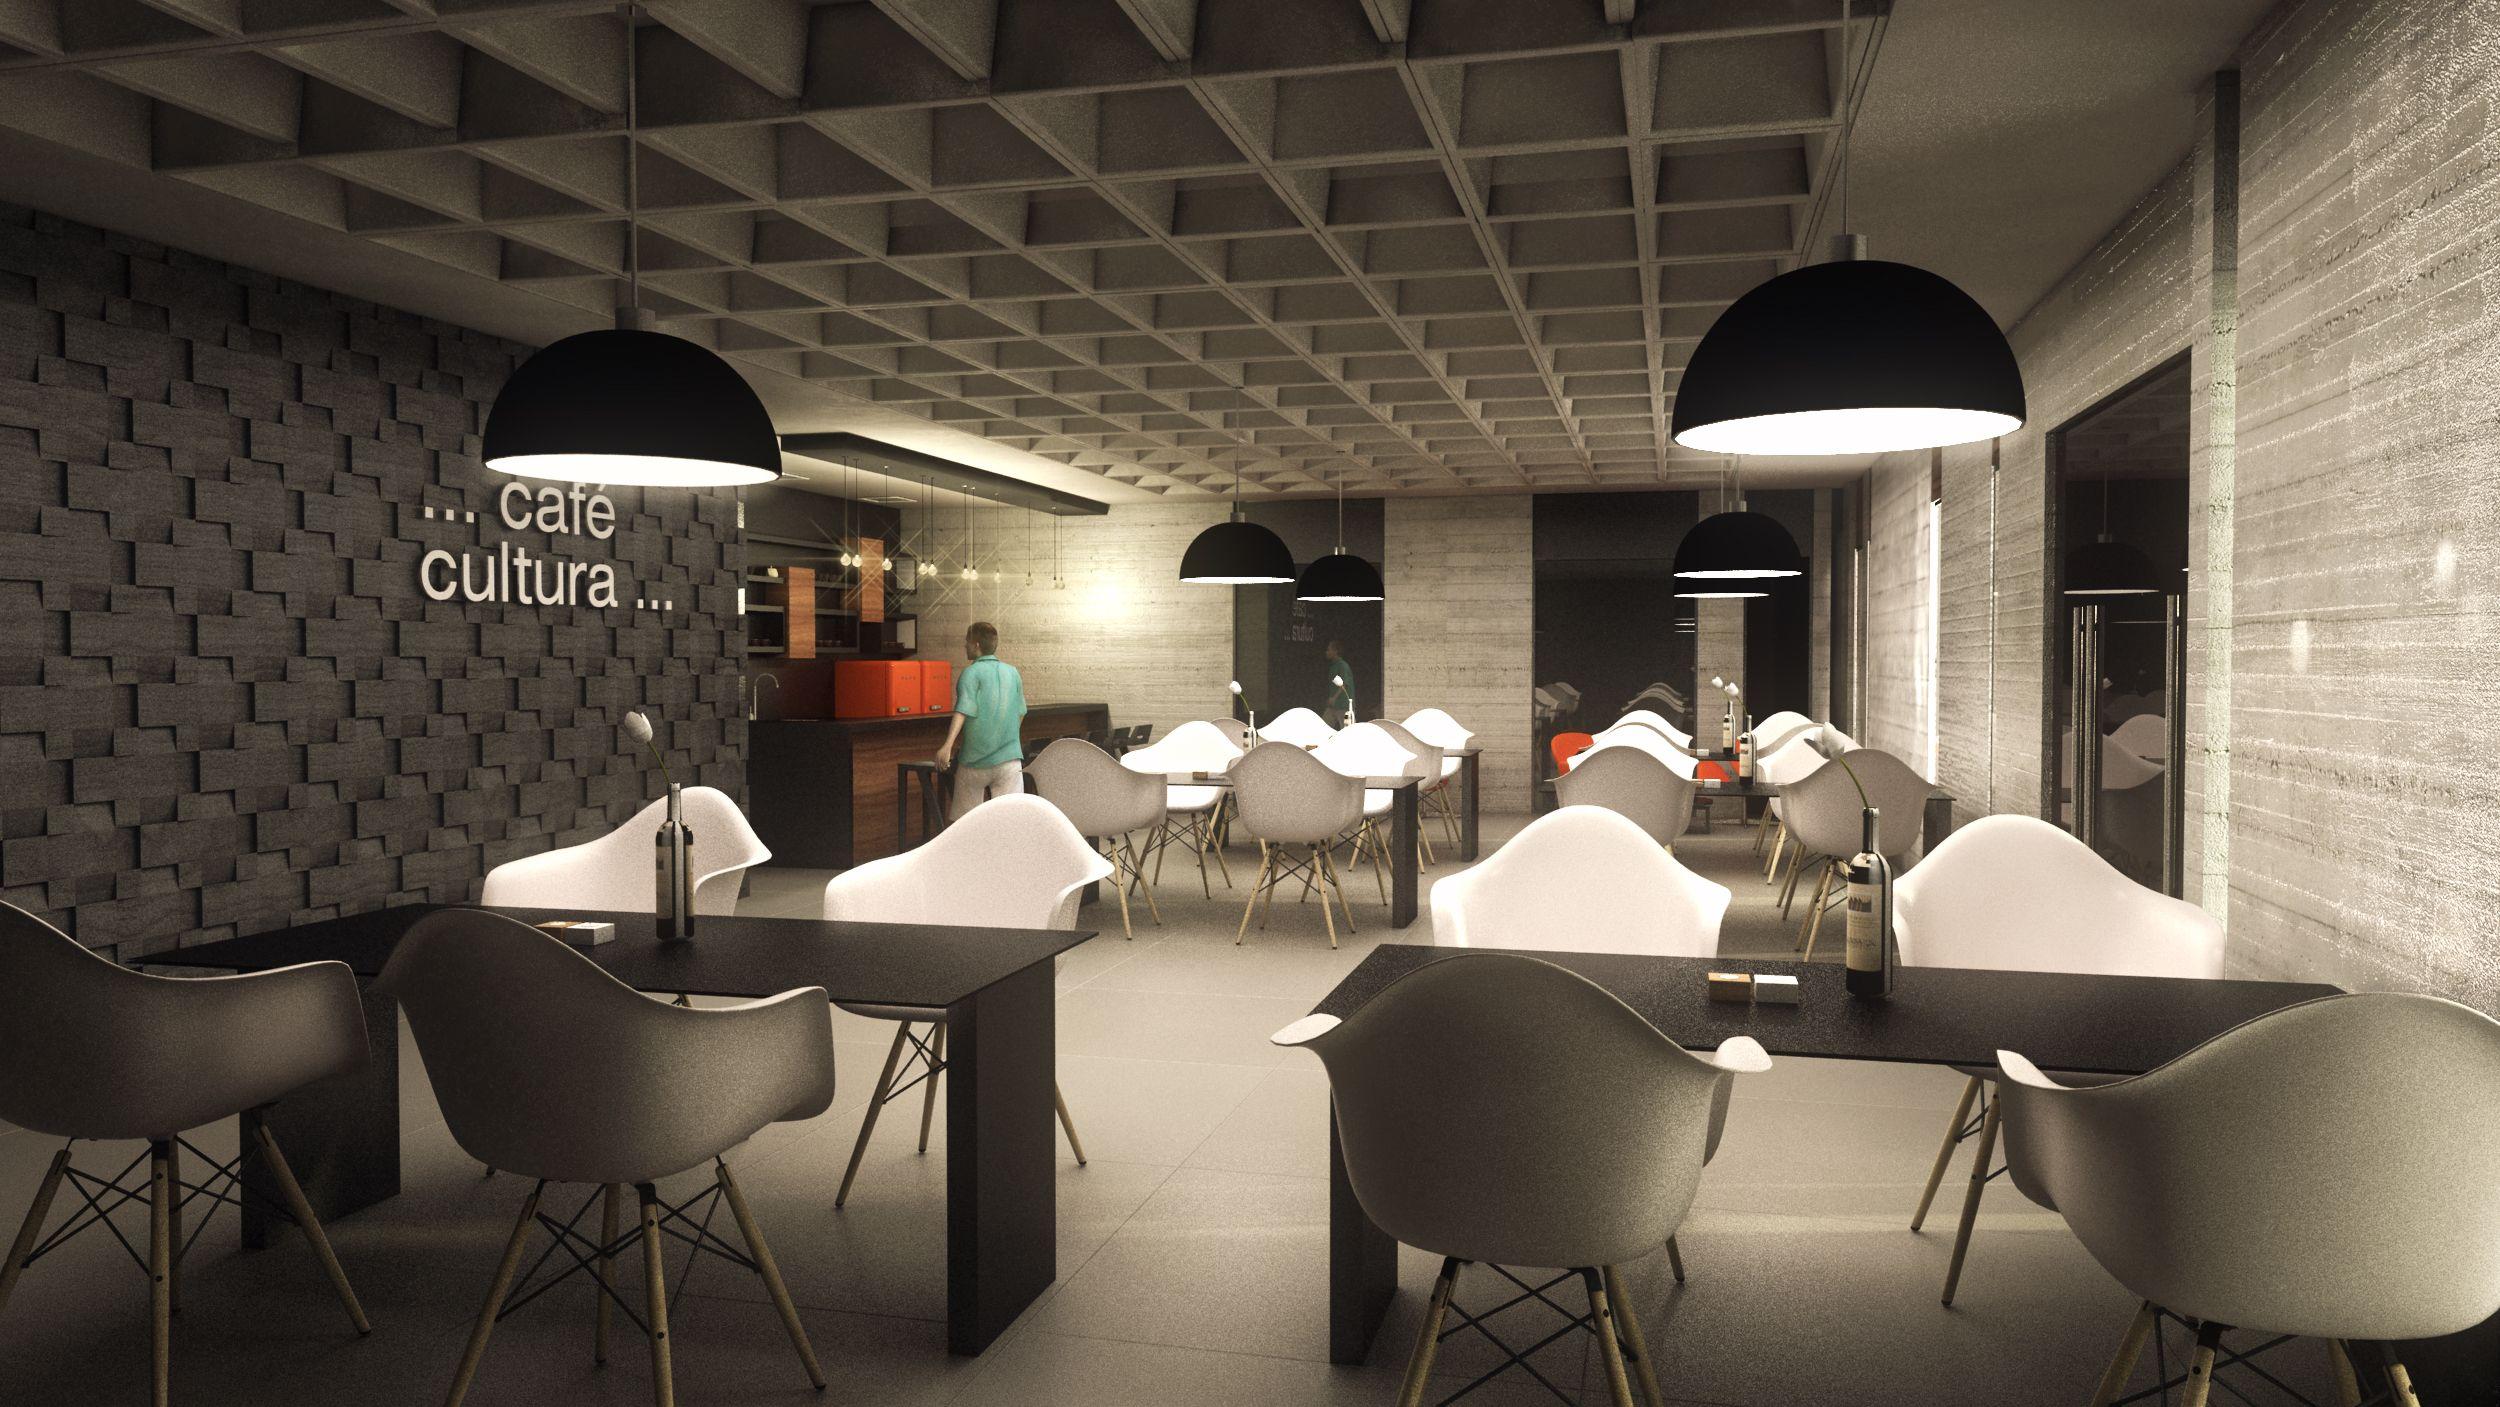 Caf Interiores Poltrona R Stico Estilo Industrial Laje Nervurada